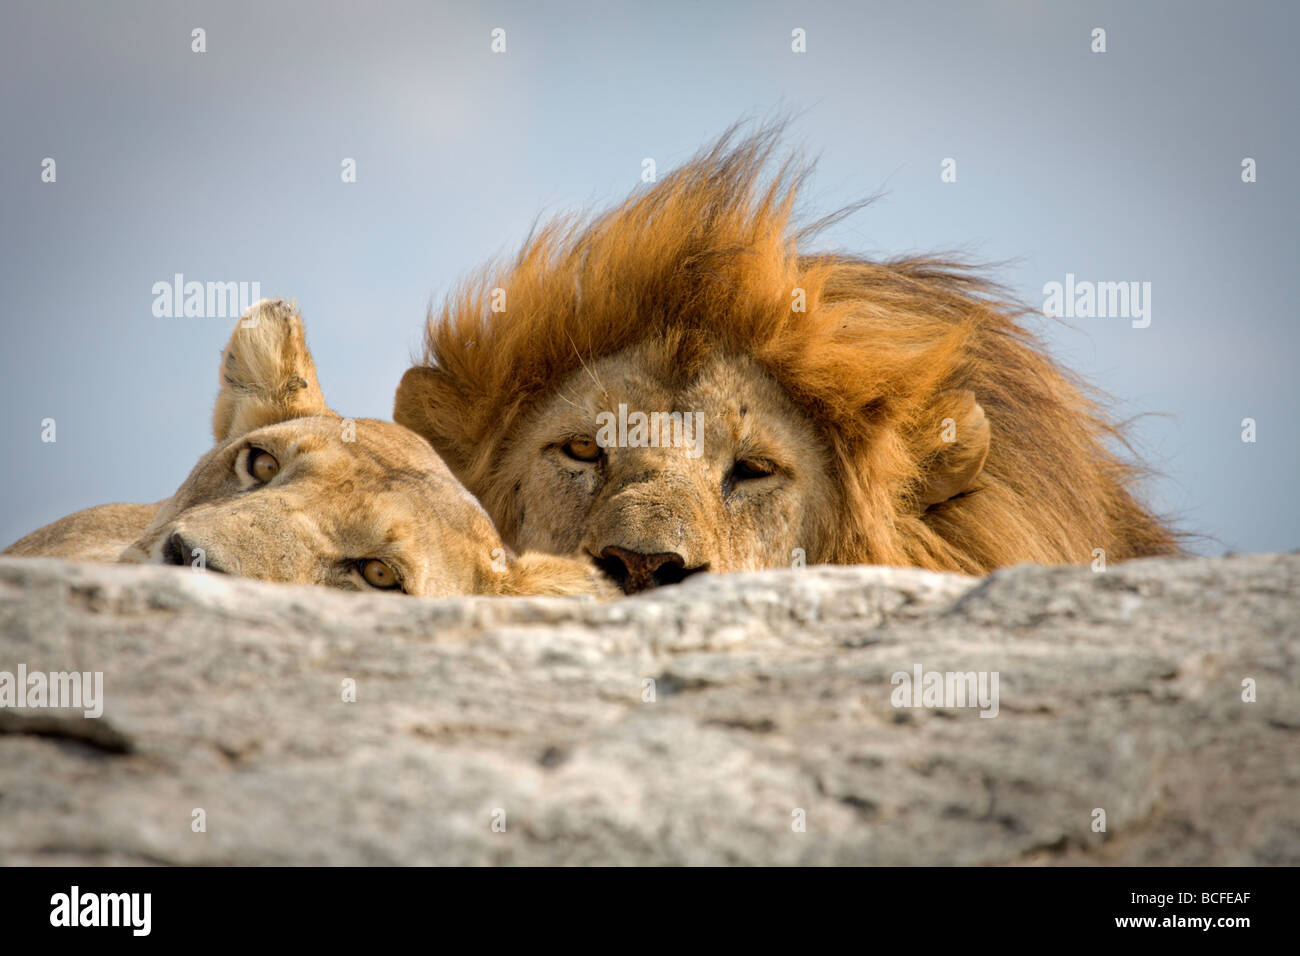 Panthera leo (el León), Parque Nacional de Serengueti, Tanzania Imagen De Stock